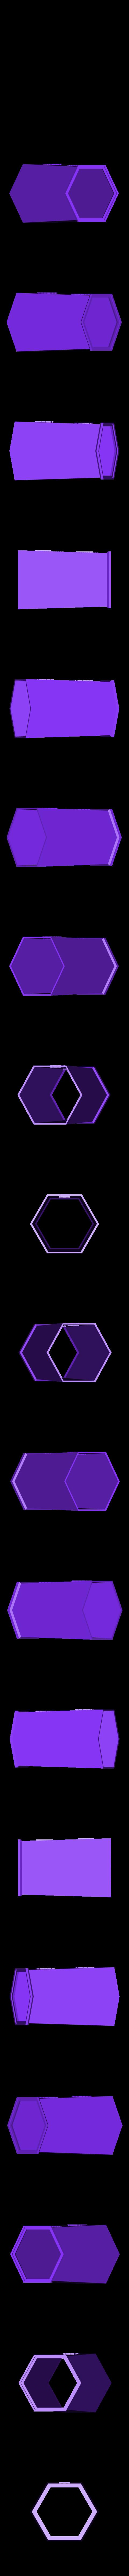 LH_hexa_body1.stl Download free STL file Hexagonal Base Lighthouse Model • 3D printable model, Ogubal3D